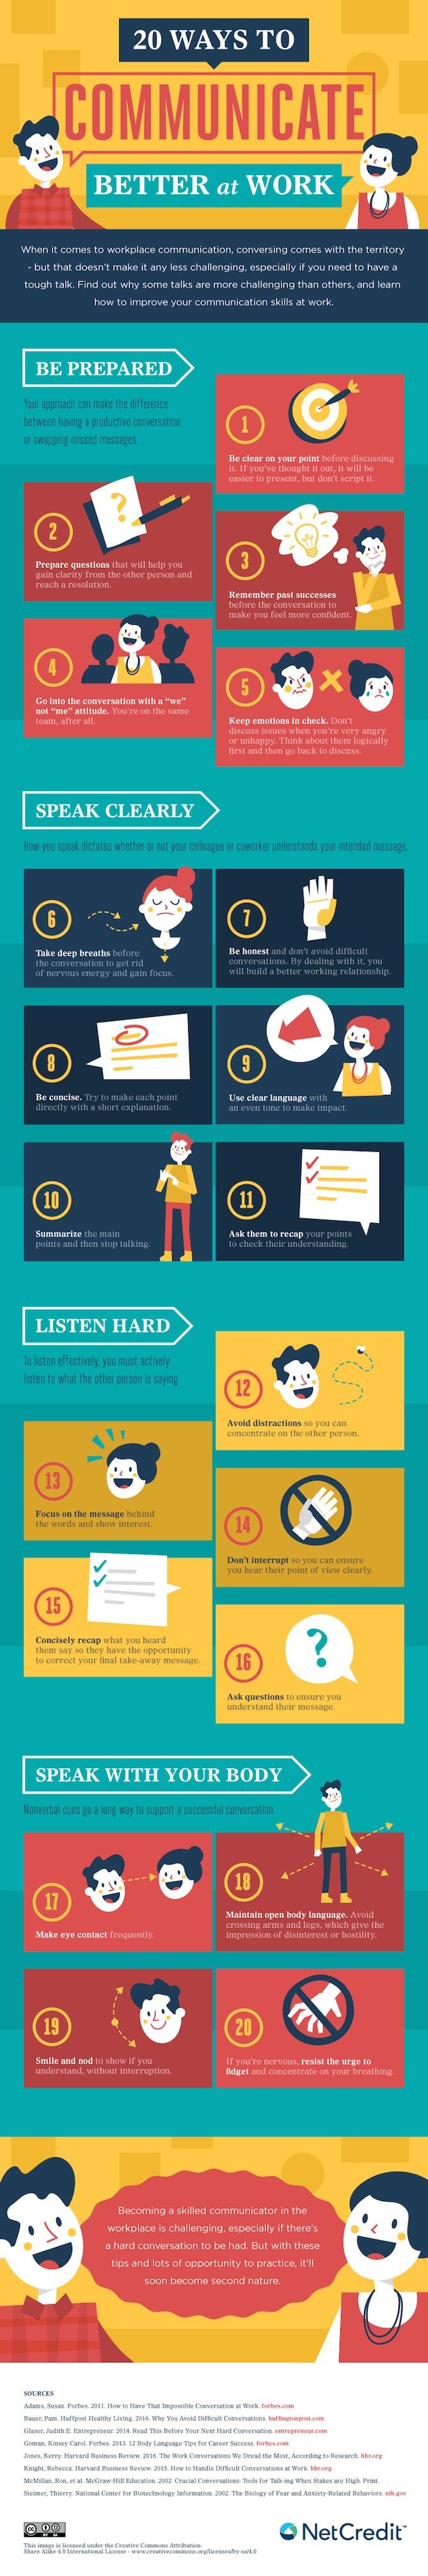 communication-skills-tips